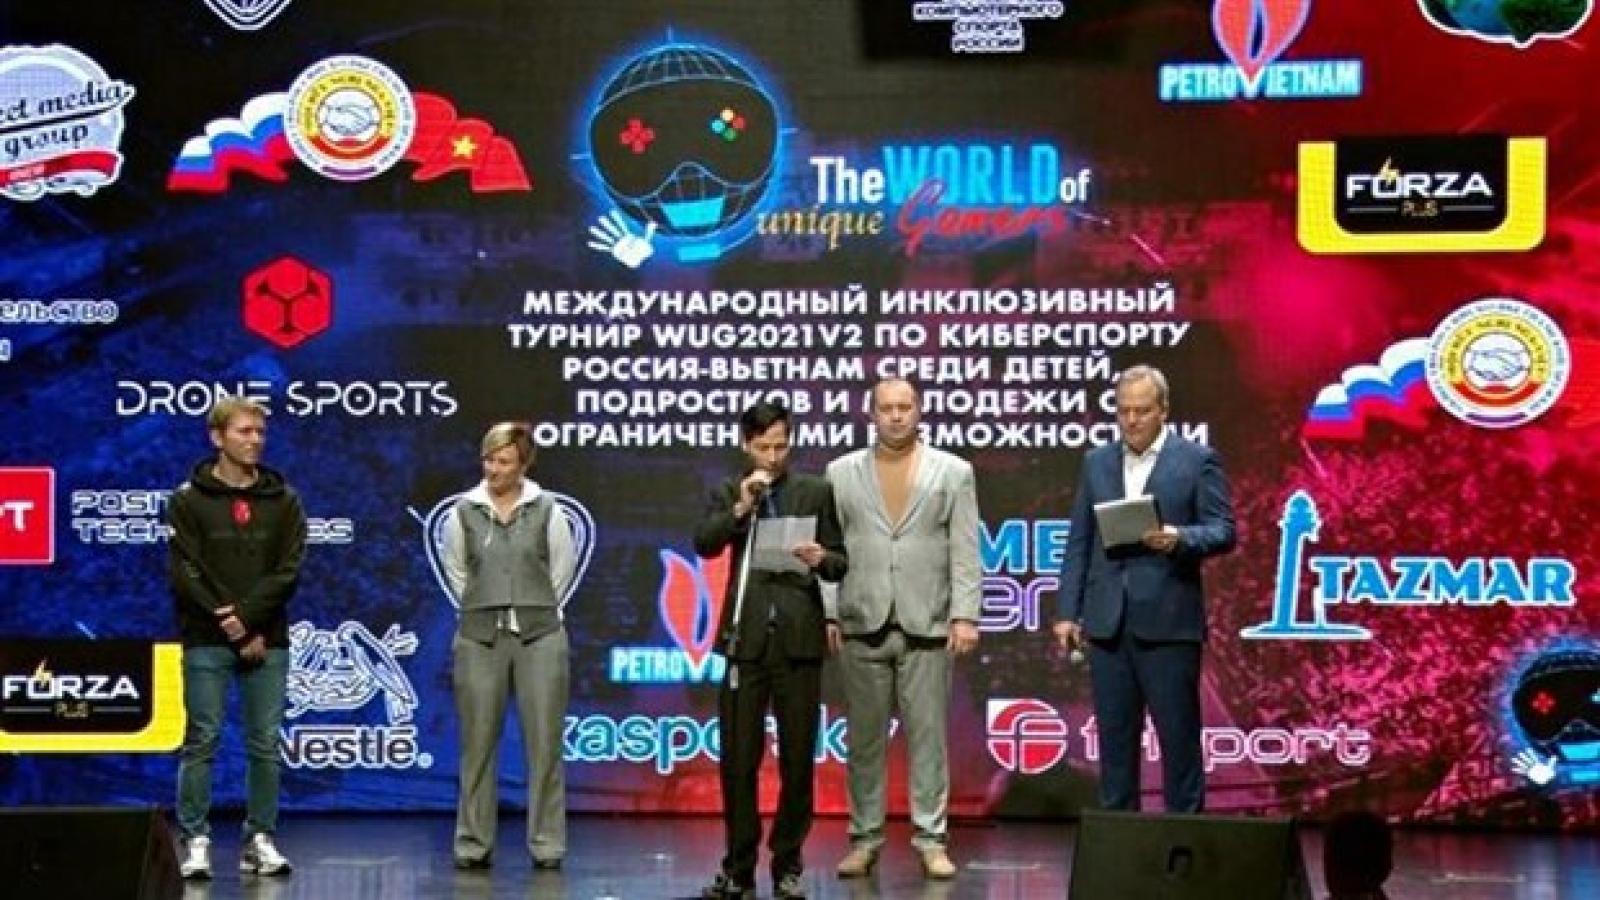 Russia-Vietnam eSports championship helps tighten humane cooperation